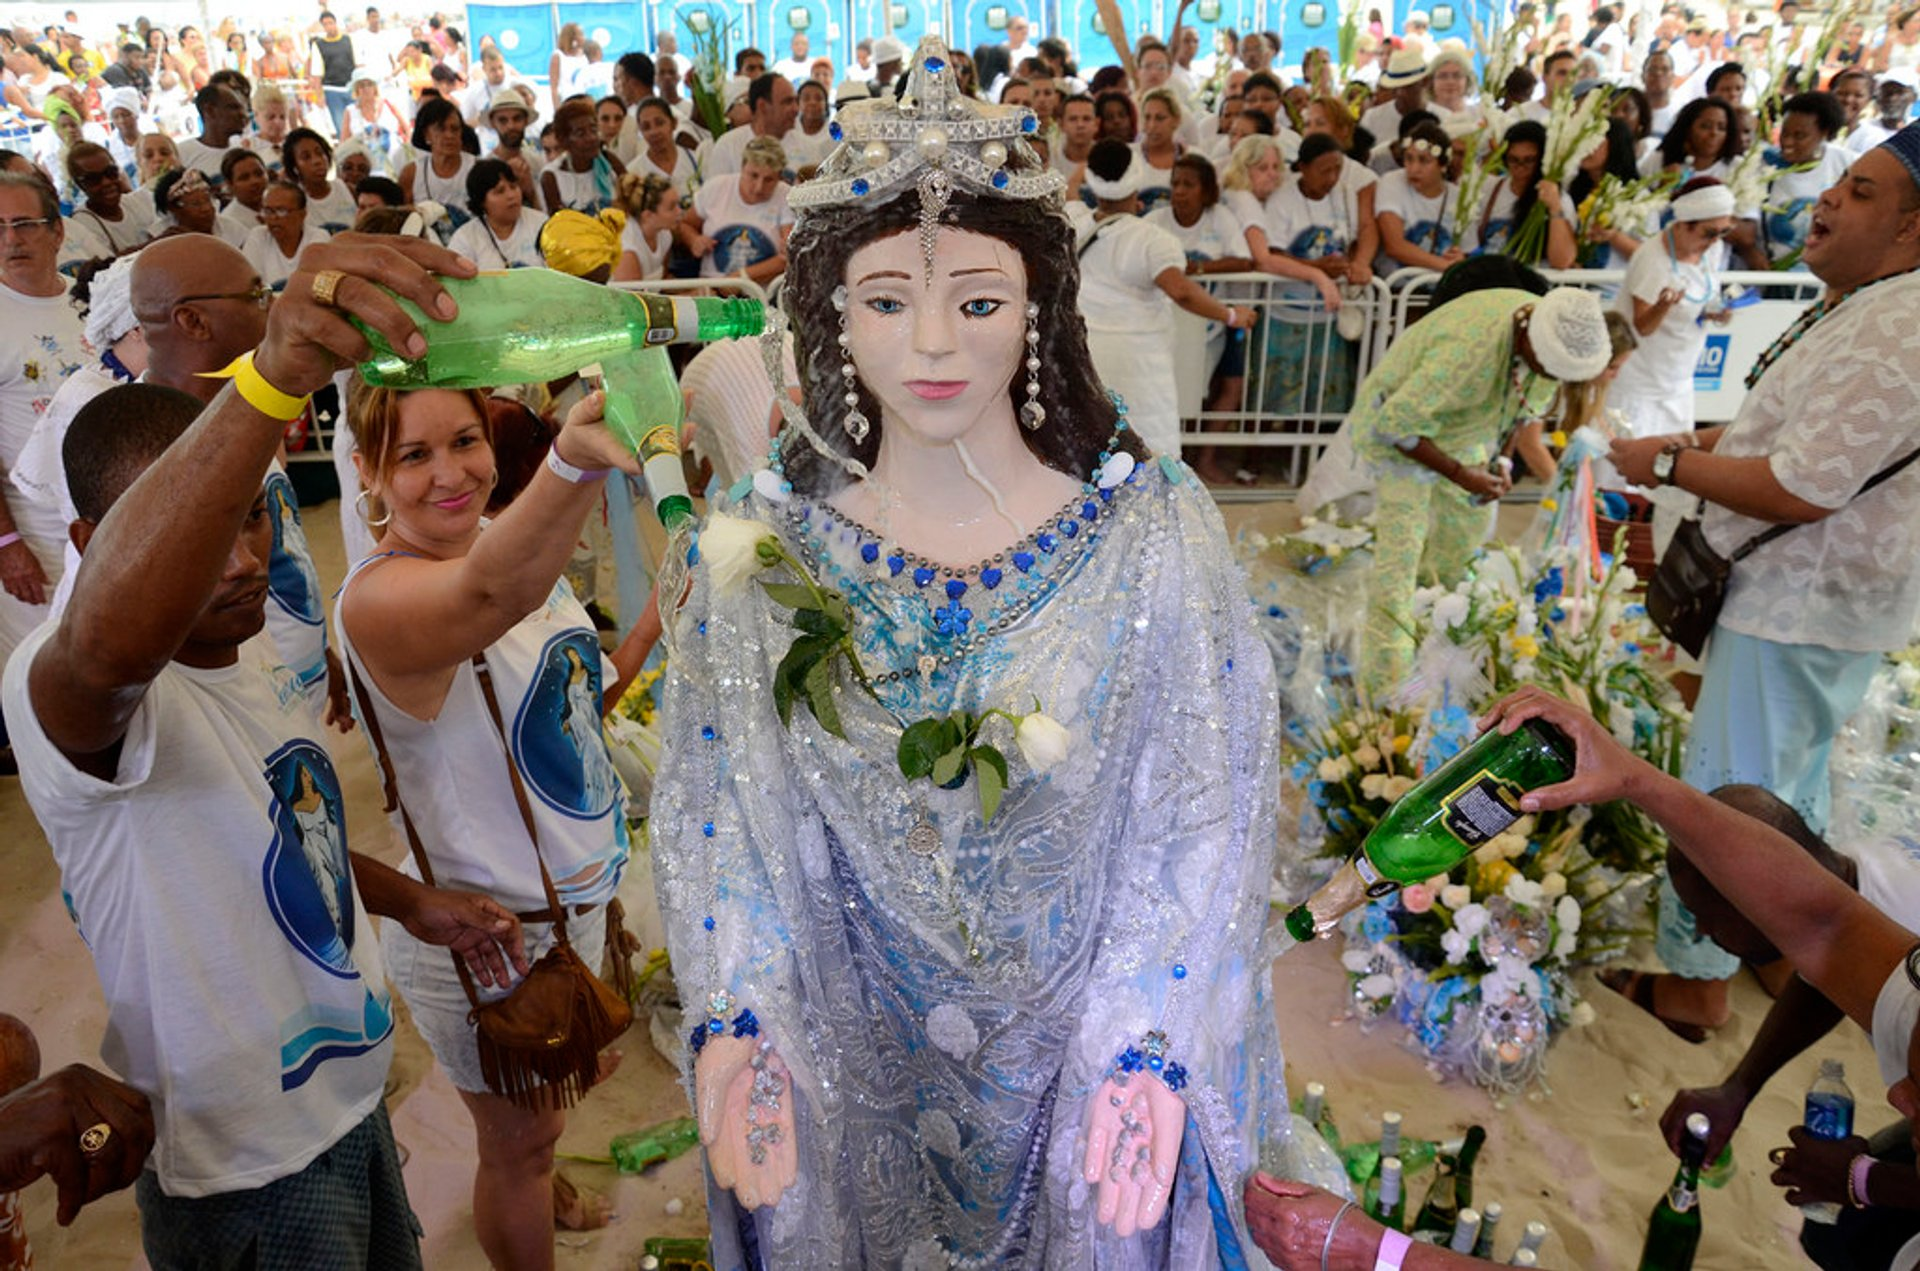 Festa da Iemanjá in Rio de Janeiro - Best Season 2020